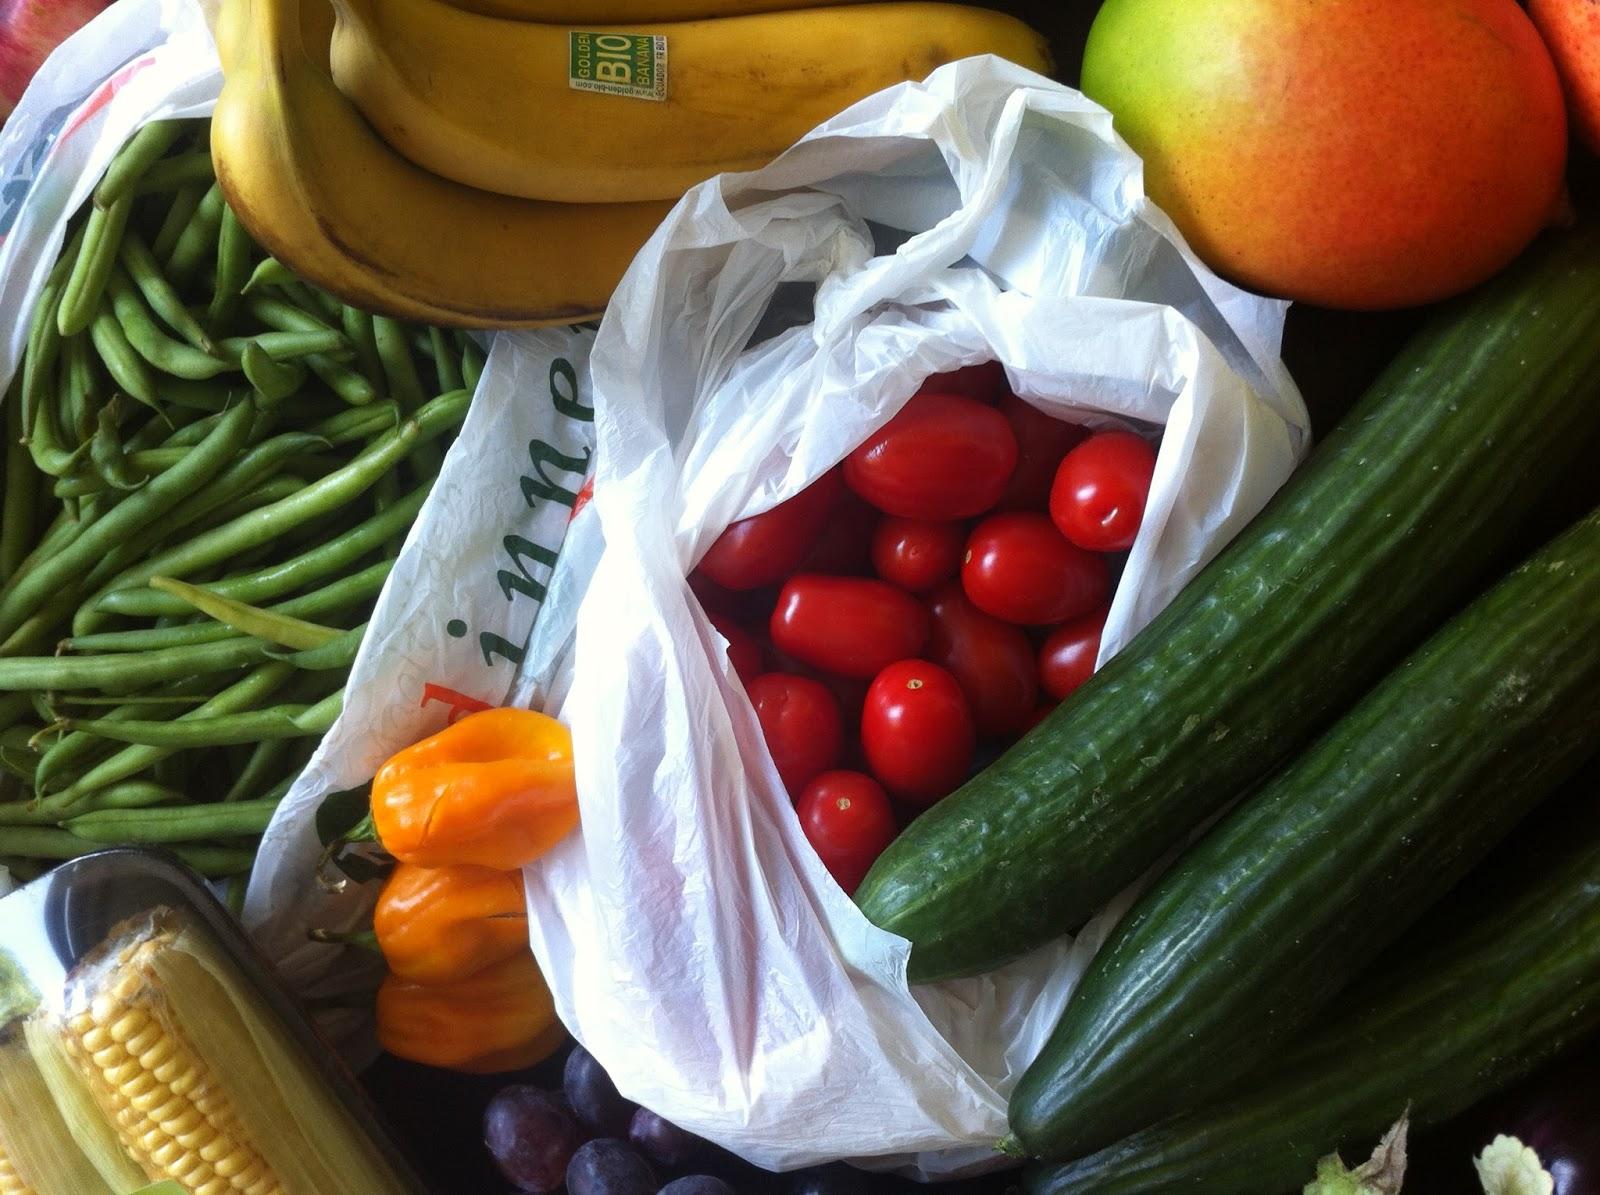 De Plantaardige Keuken: augustus 2013